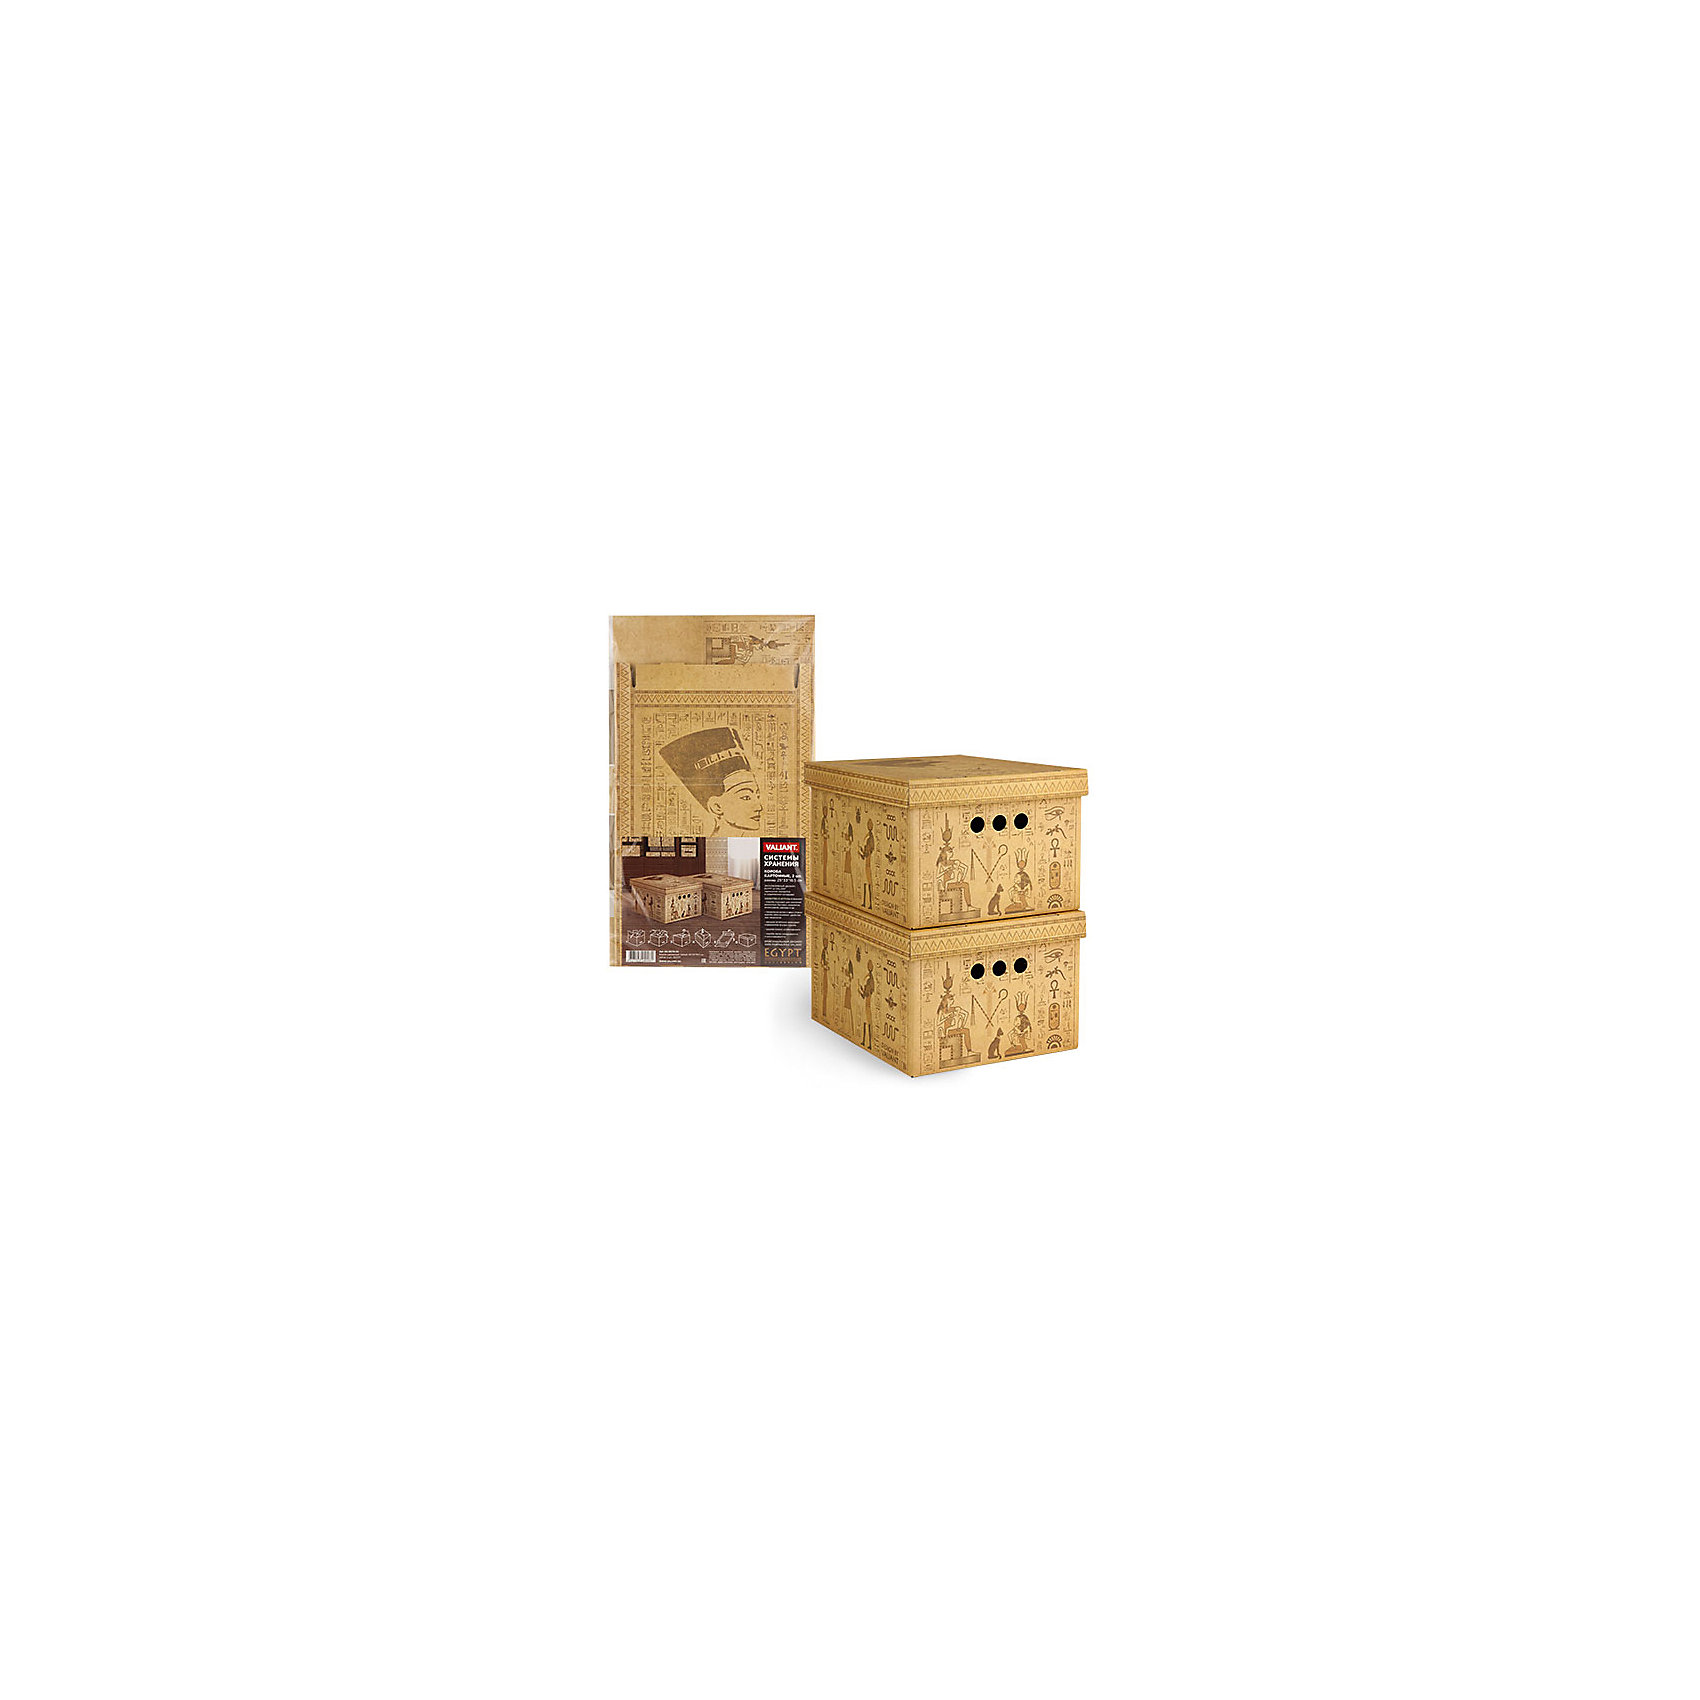 VALIANT Короб картонный, складной, малый, 25*33*18.5 см, 2 шт., EGYPT, Valiant